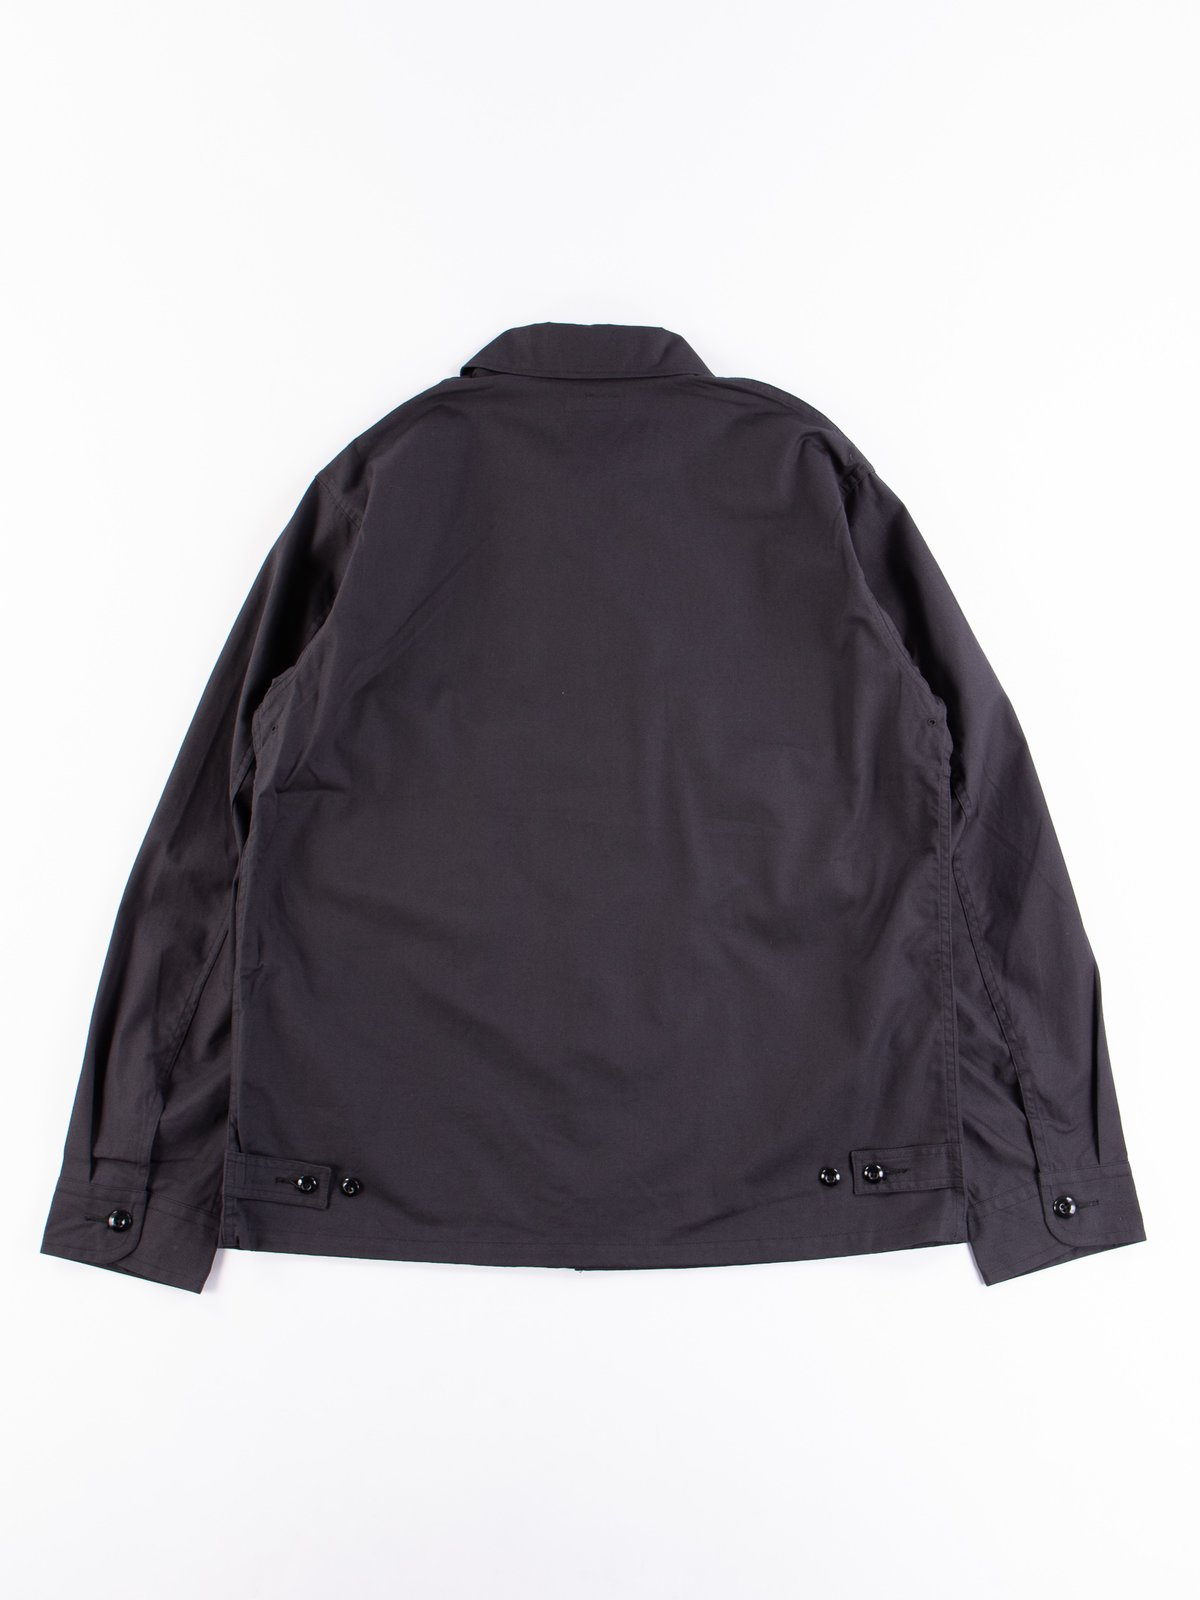 Fade Black Selvedge Poplin Cotton Combat Short Jacket - Image 5